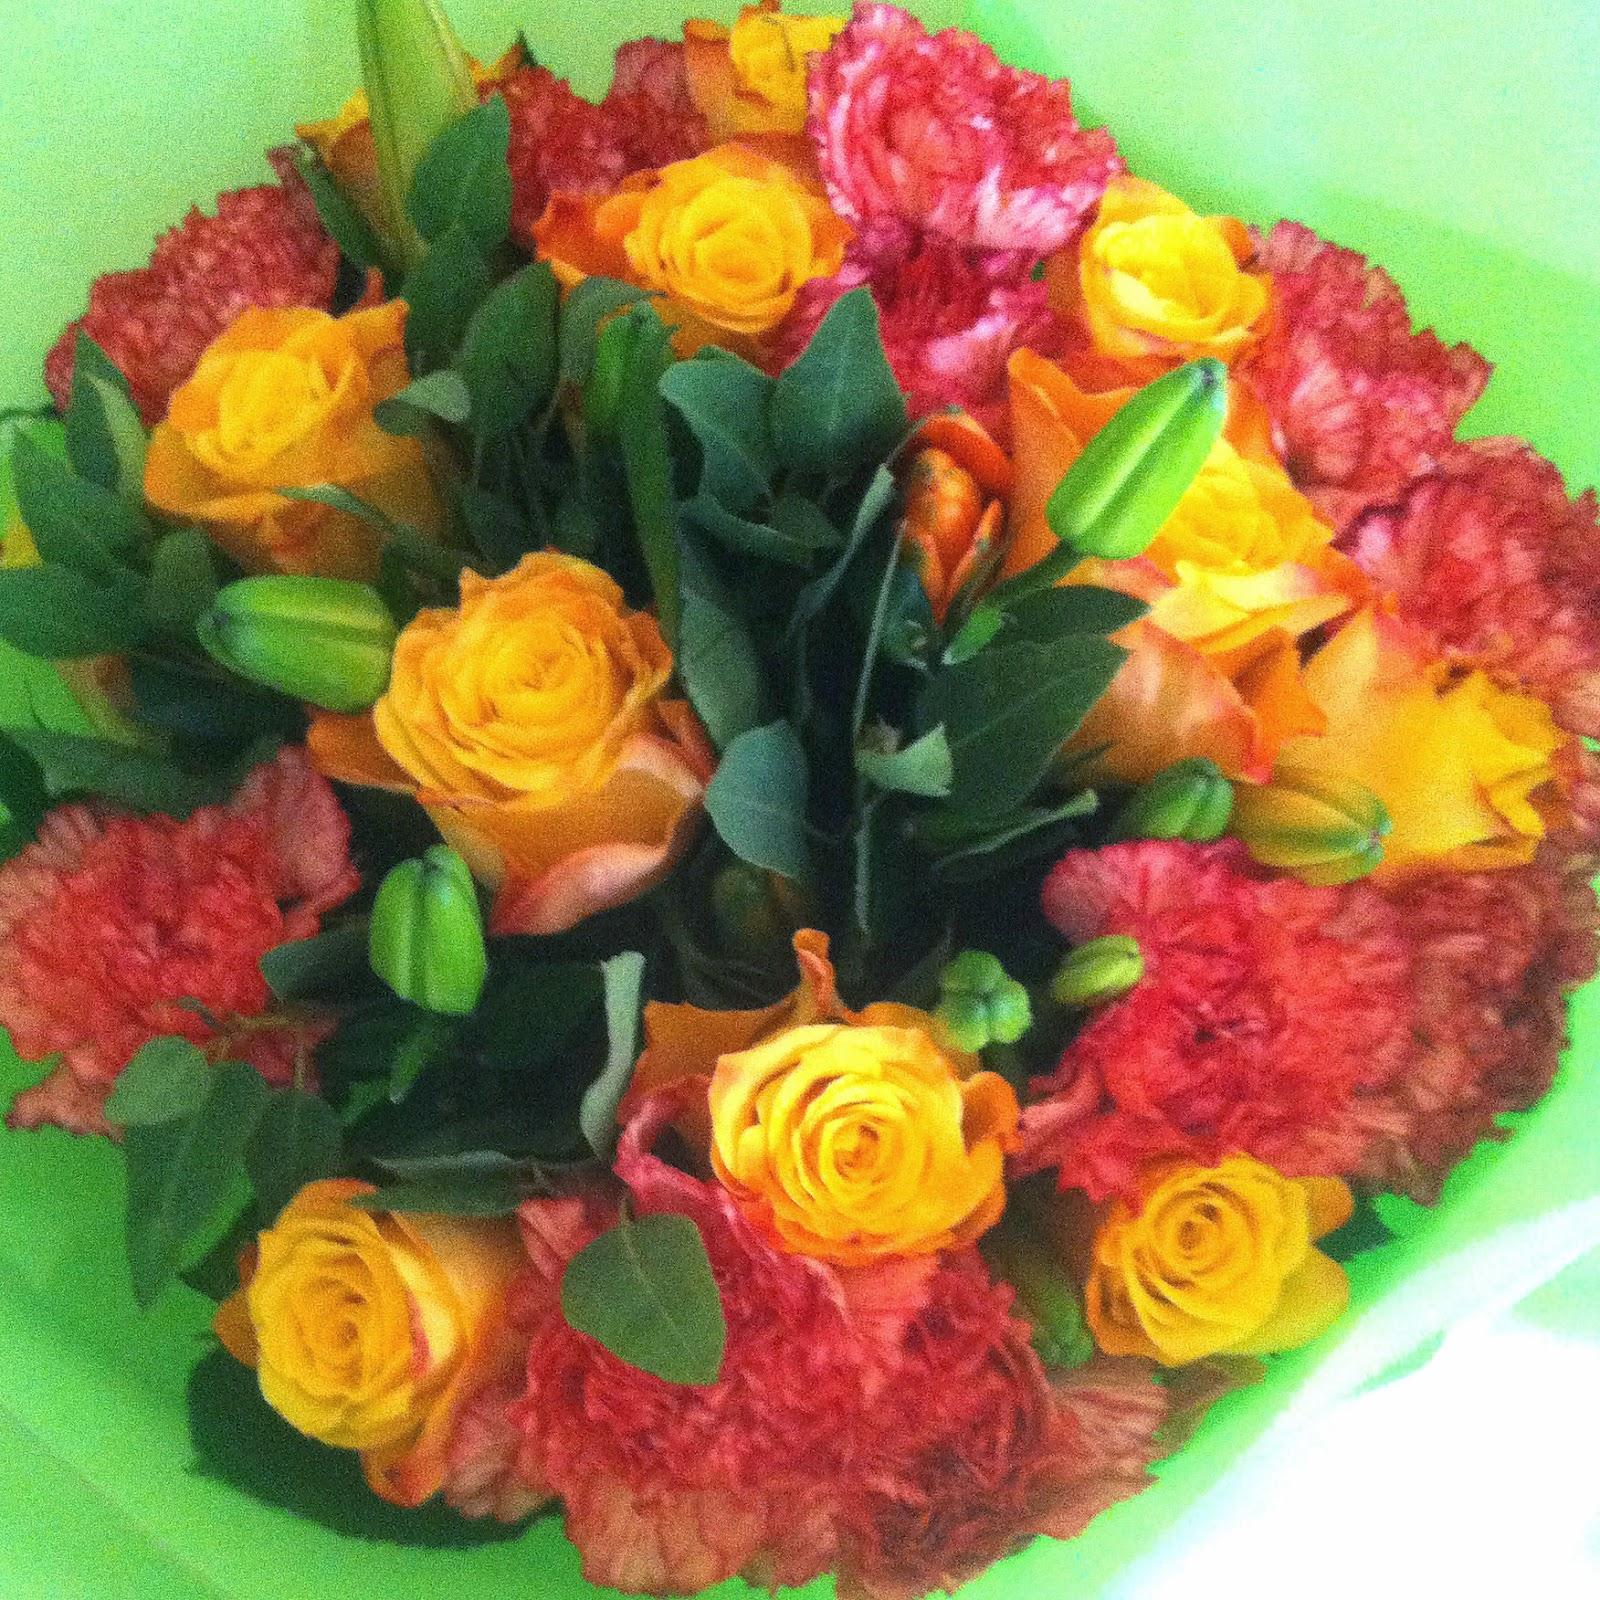 Autumn Morning Bouquet - Debenhams Flowers - Laura Trends